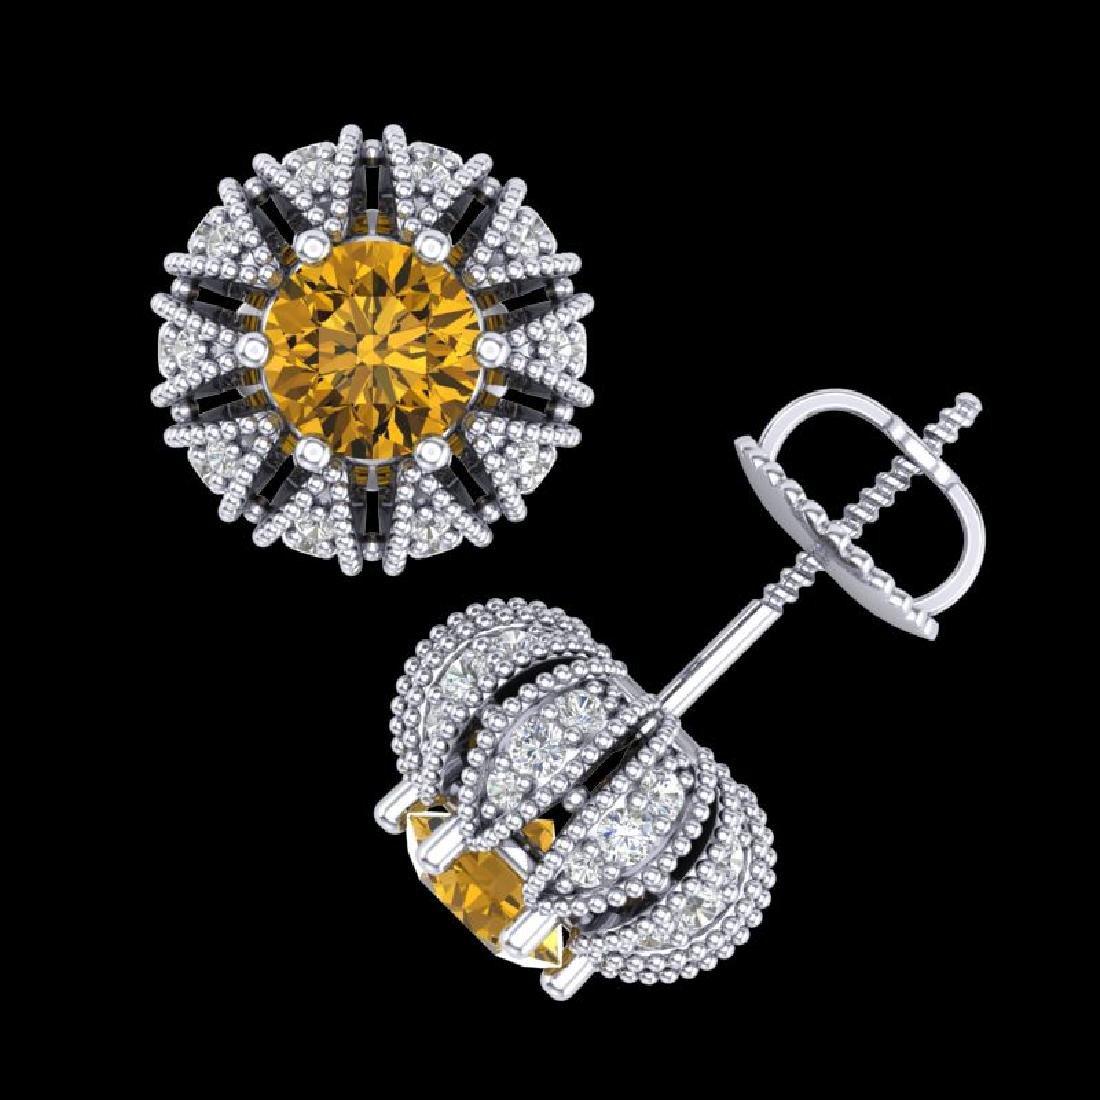 2.01 CTW Intense Fancy Yellow Diamond Art Deco Stud - 3